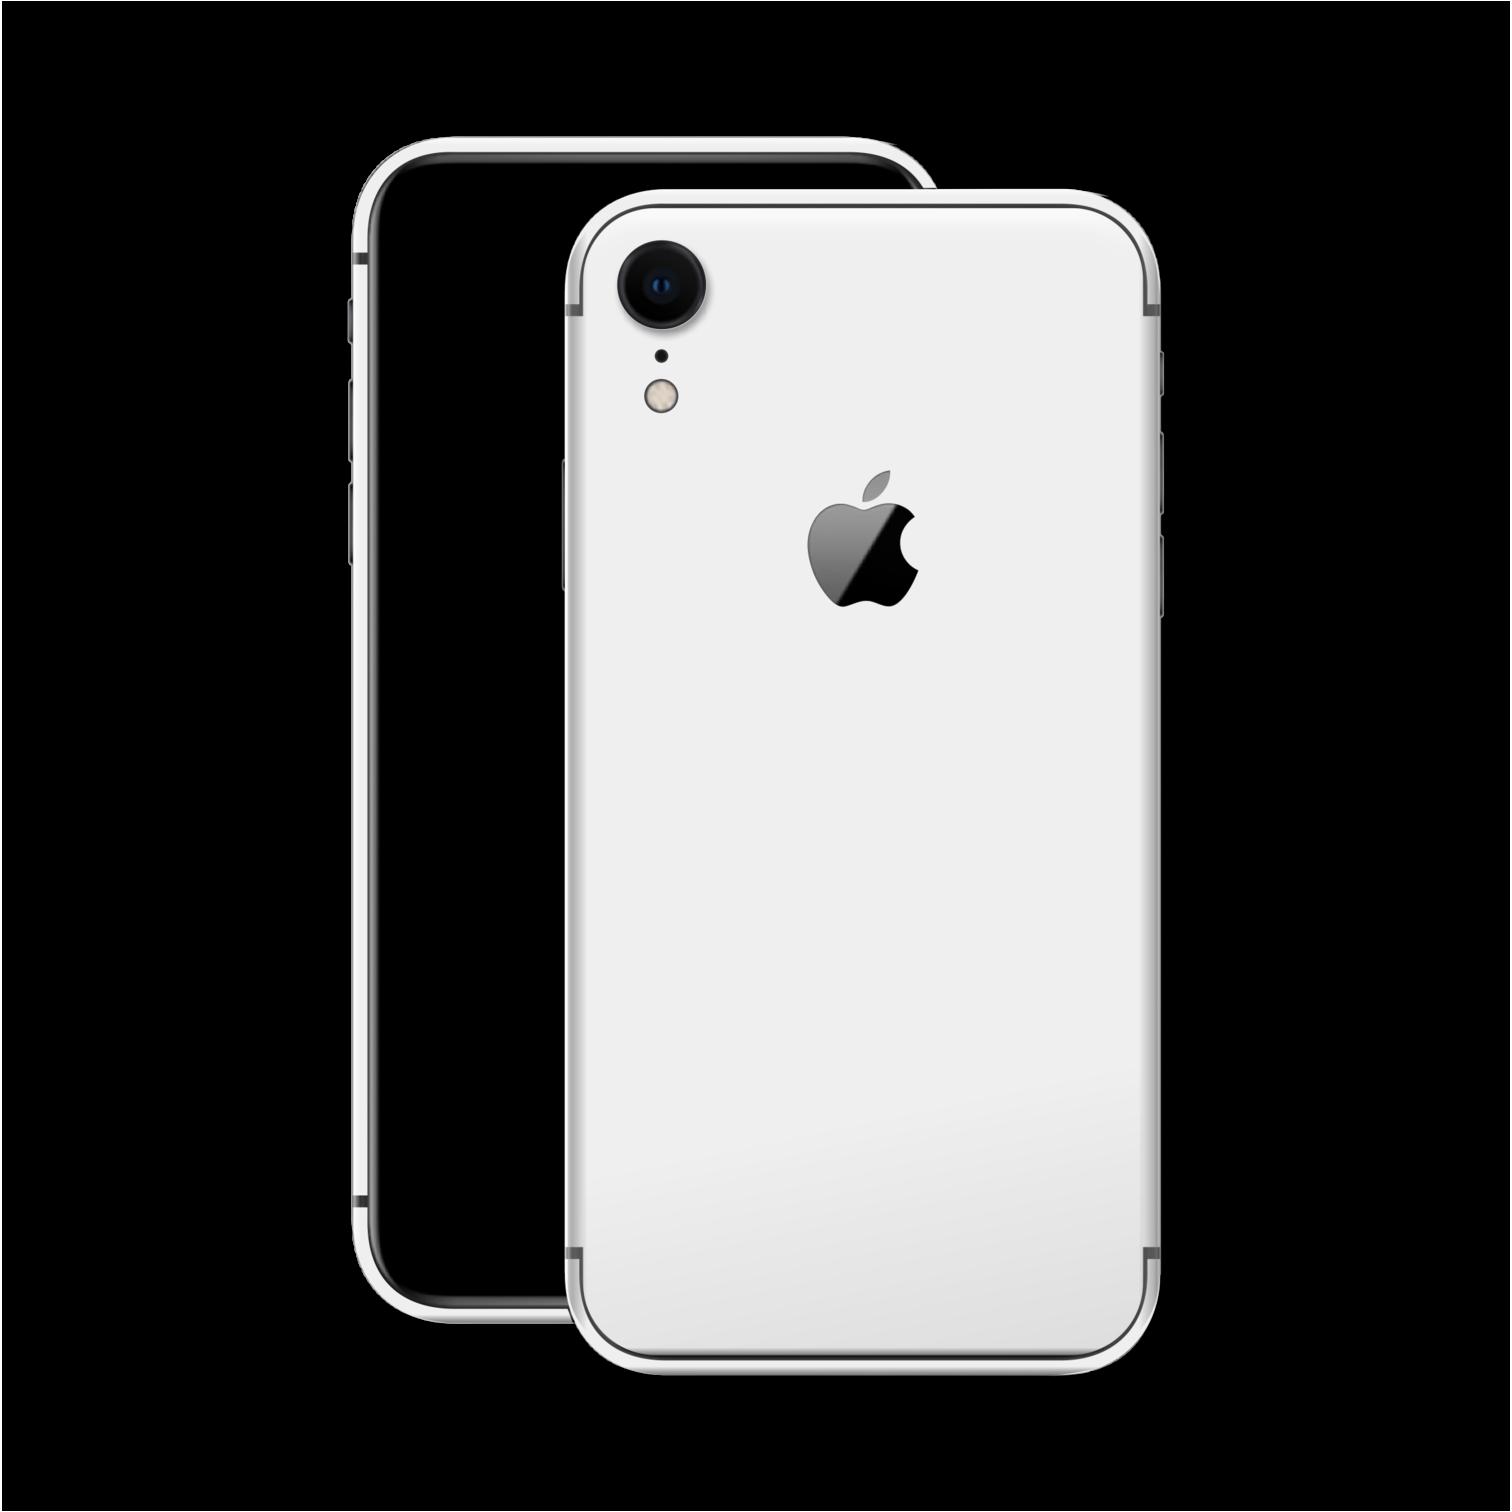 Iphone Xr Gloss Jet White Skin Iphone Jet White White Iphone